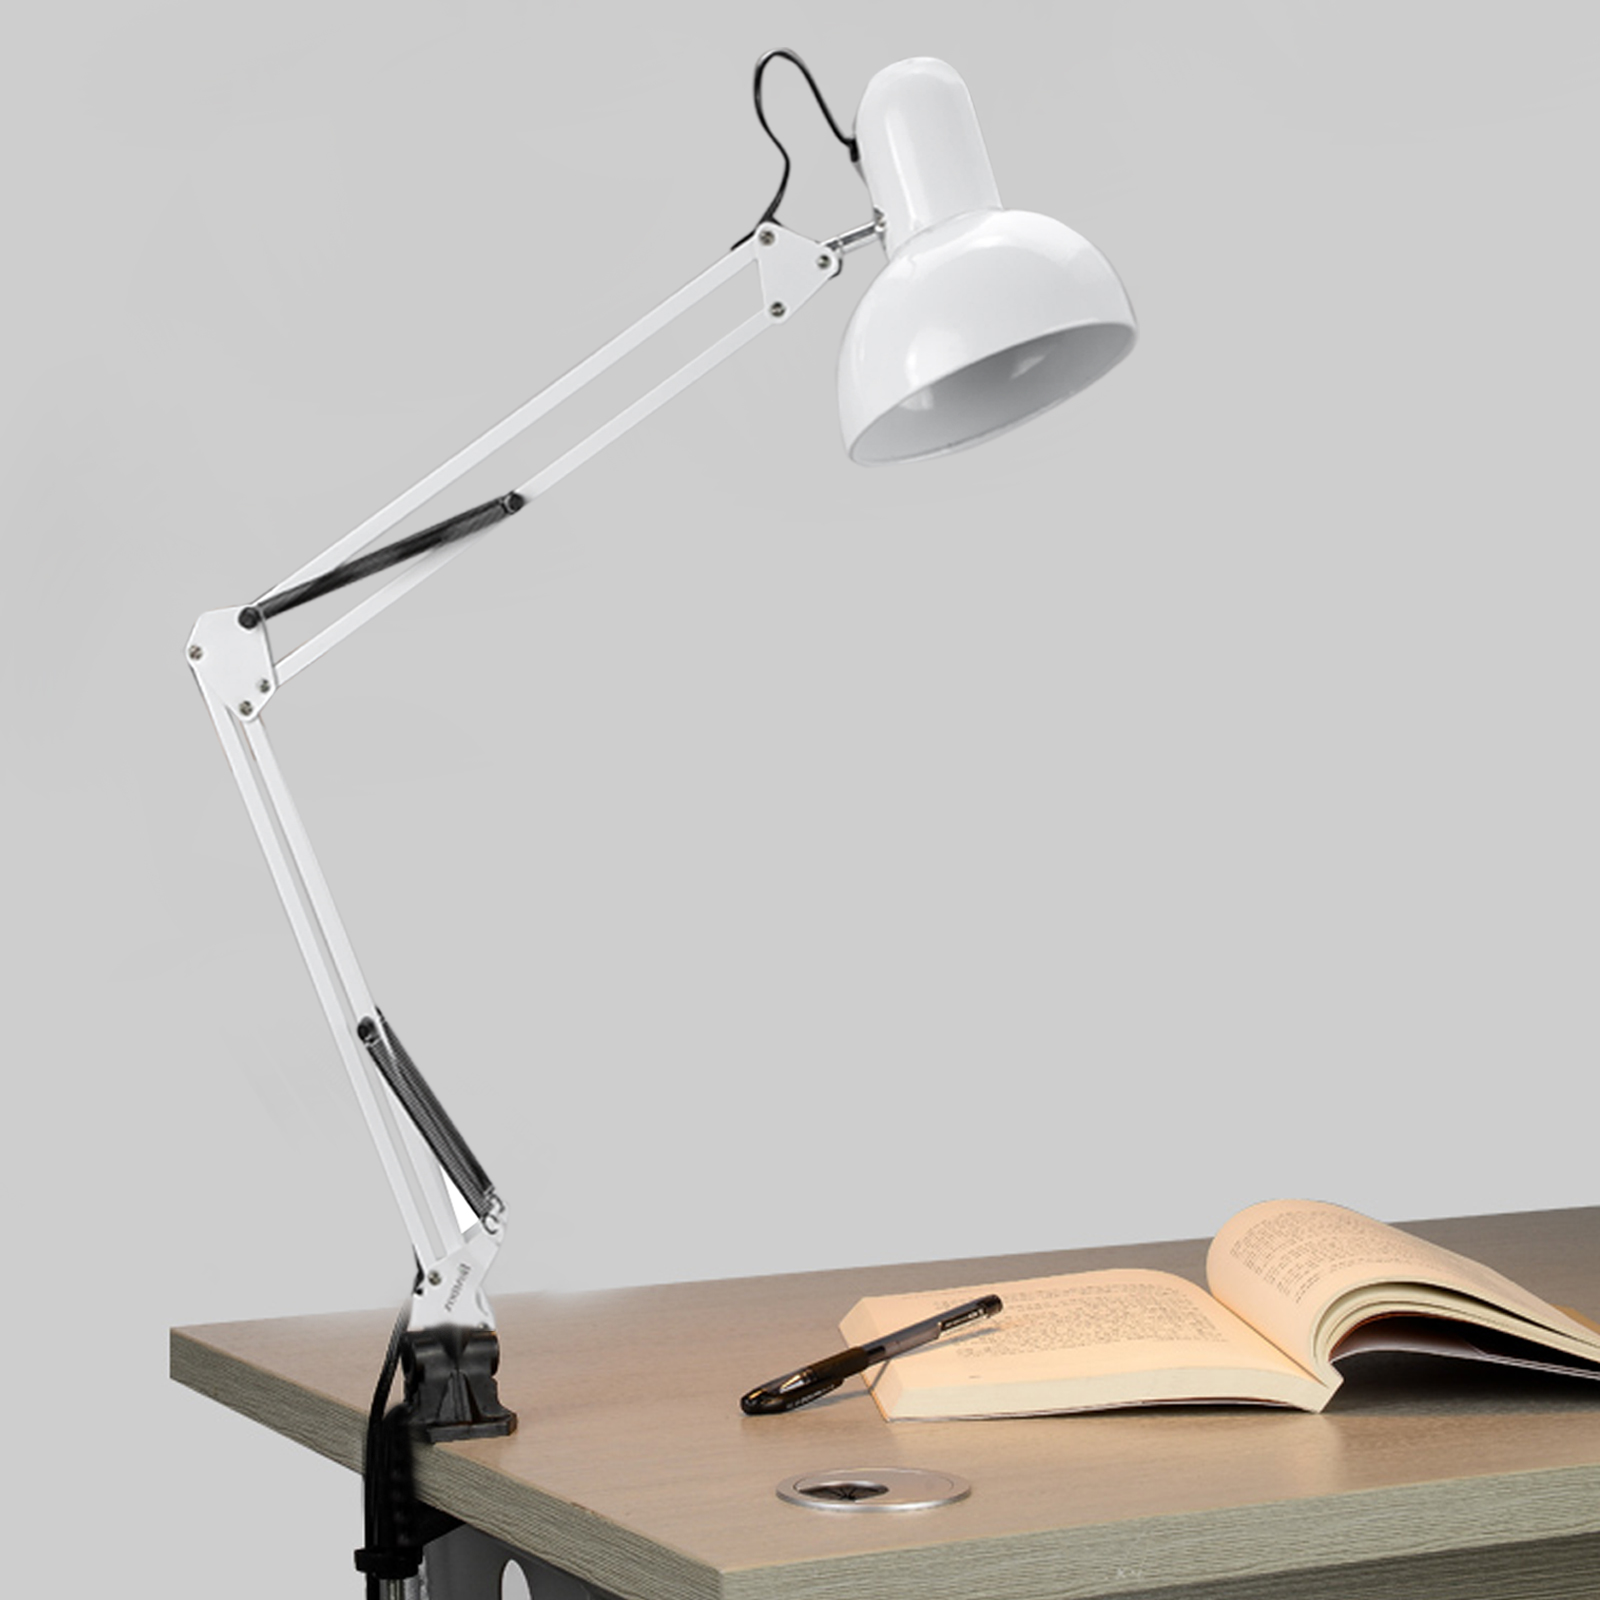 Drafting table light - Homdox Desk Lamps Adjustable Arm Drafting Eyes Care Clamp Home Lighting Desk Lamp Light